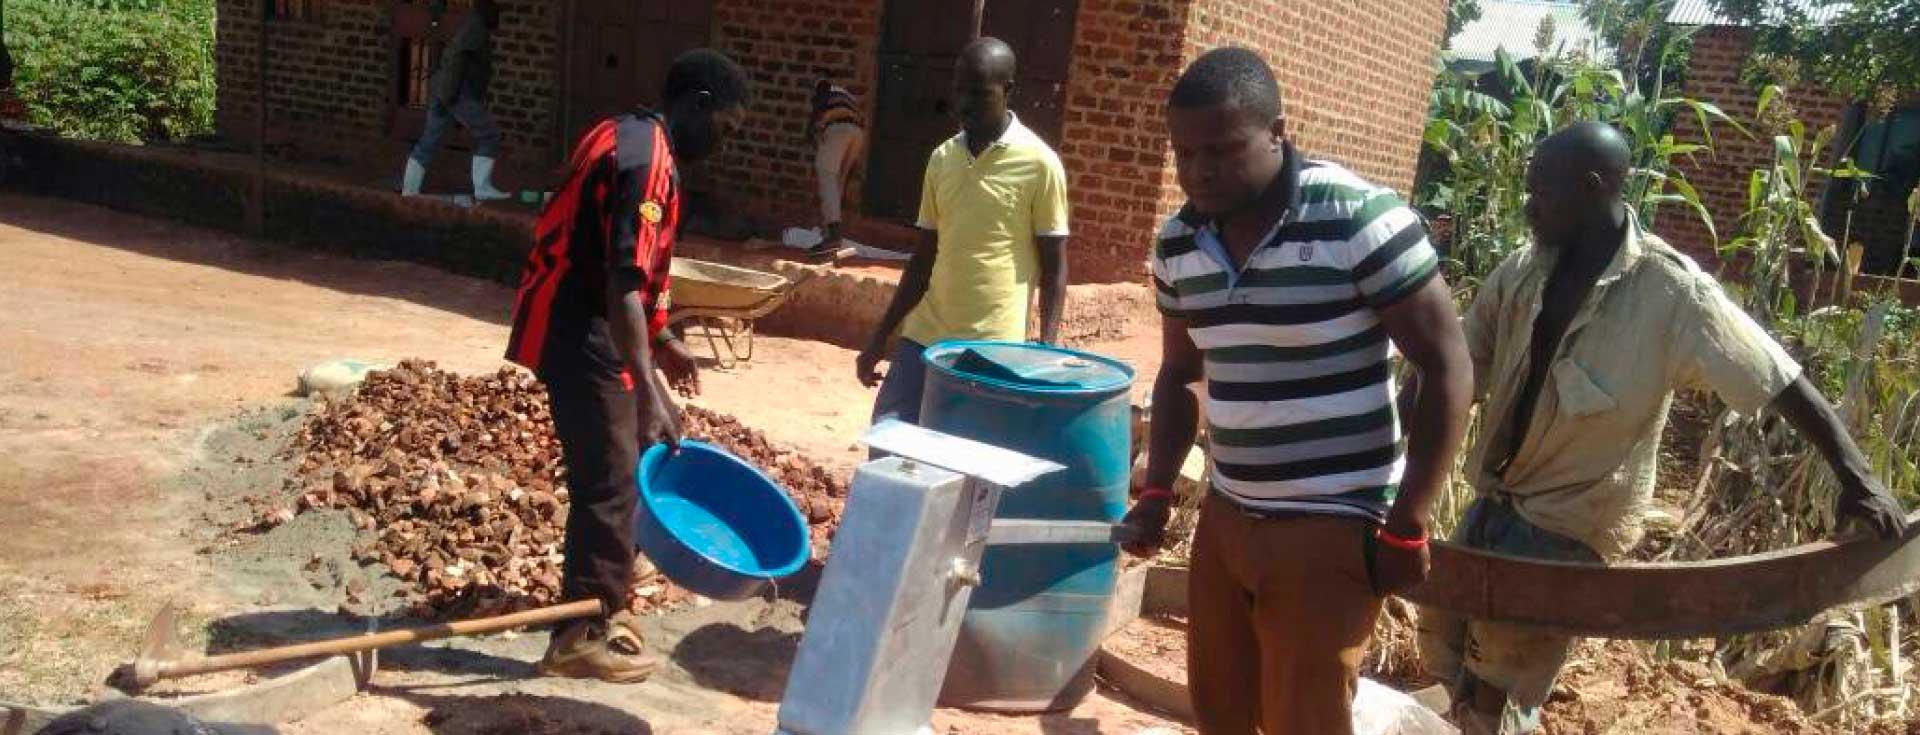 Schulaufbau KICERO-Kisaakye, Uganda